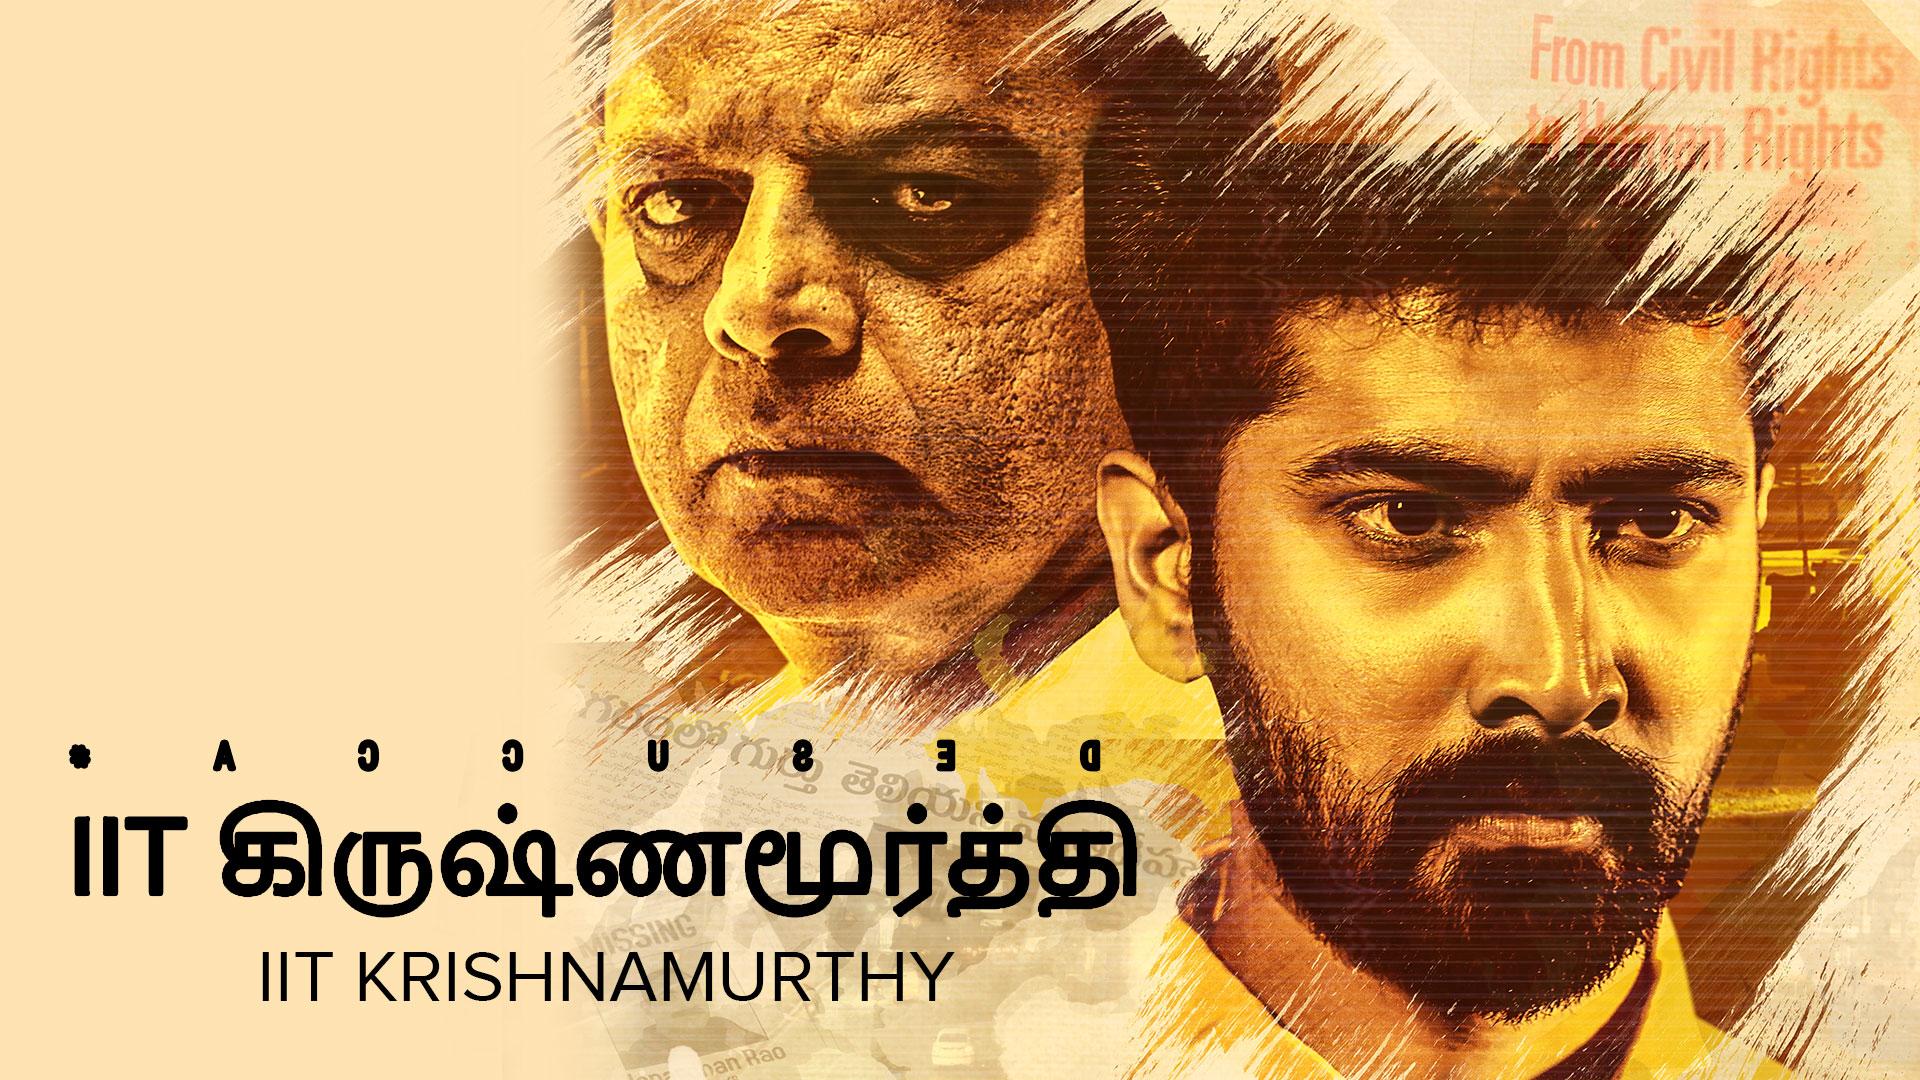 IIT Krishnamurthy (Tamil)